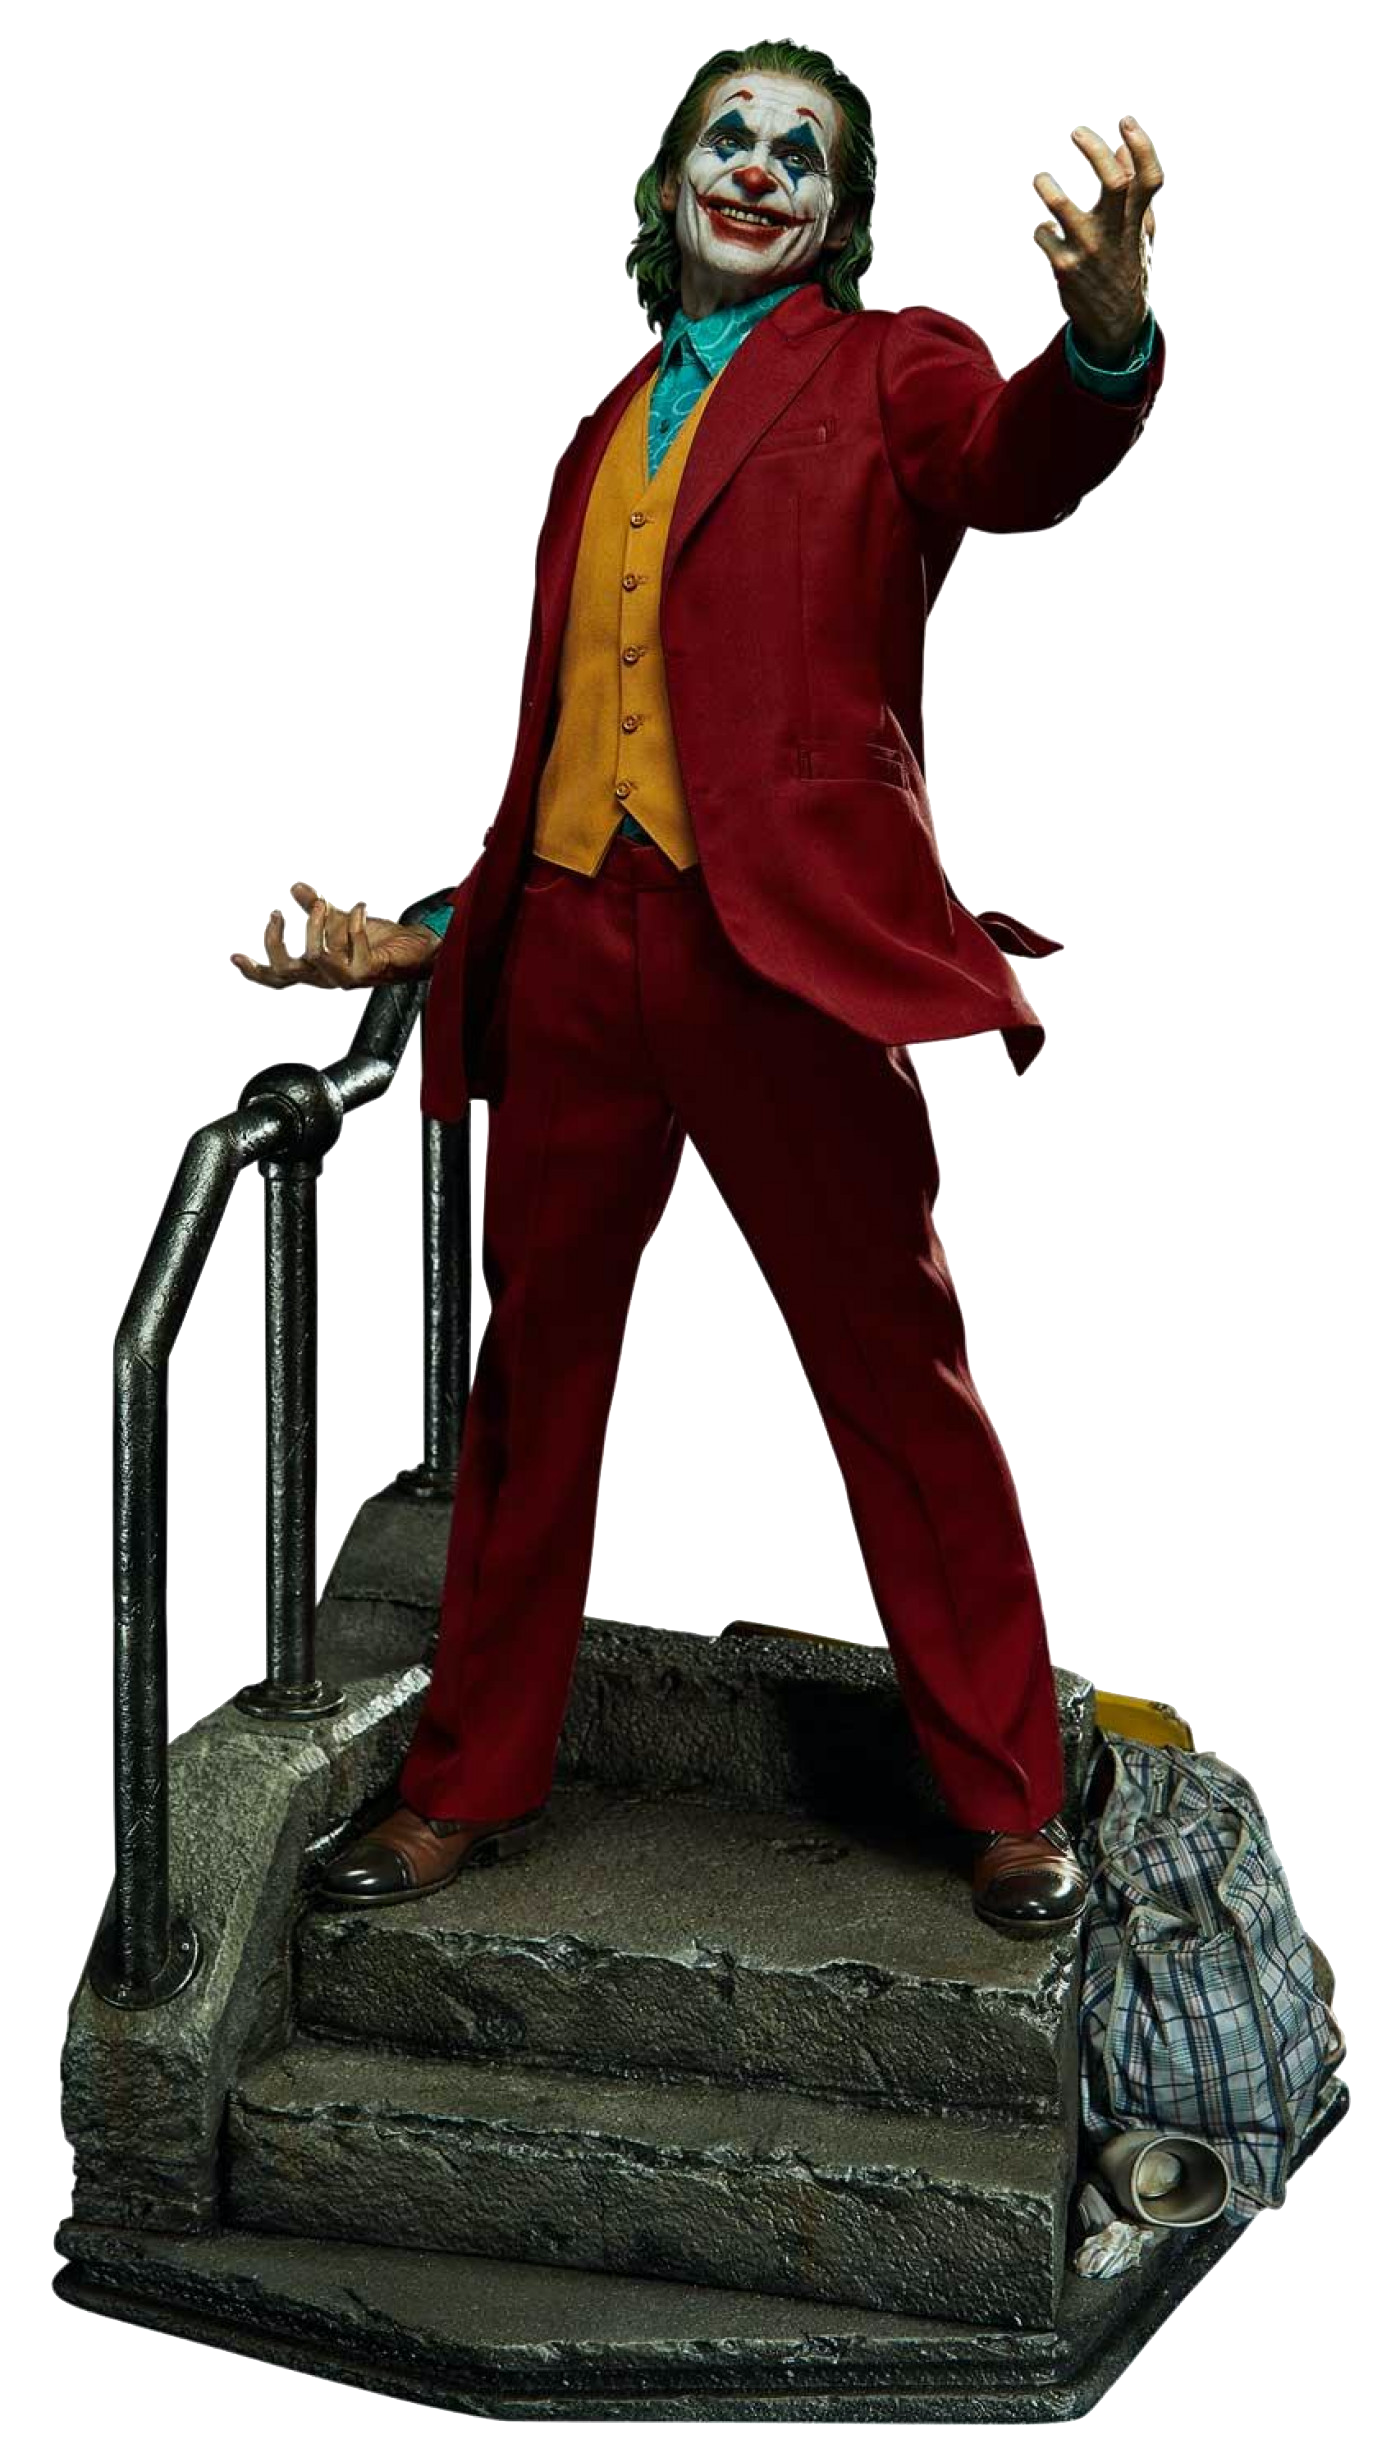 prime1-studio-blitzway-joker-the-joker-joaquin-phoenix-1:3-bonus-statue-toyslife